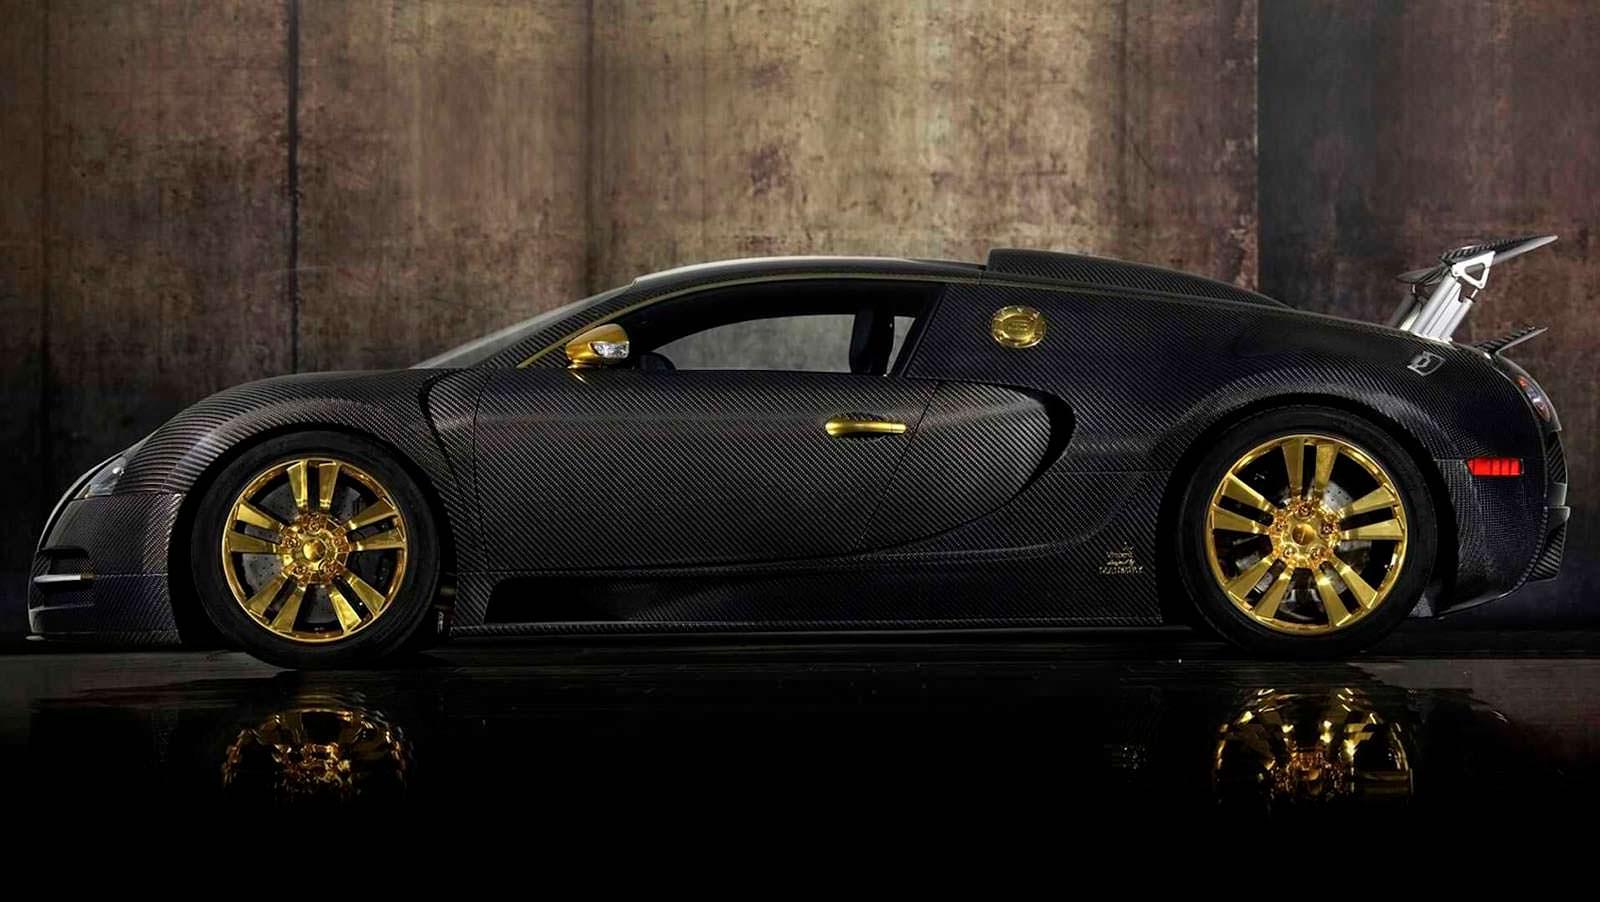 Тюнинг Bugatti Veyron Mansory Linea Vincero карбон и золото